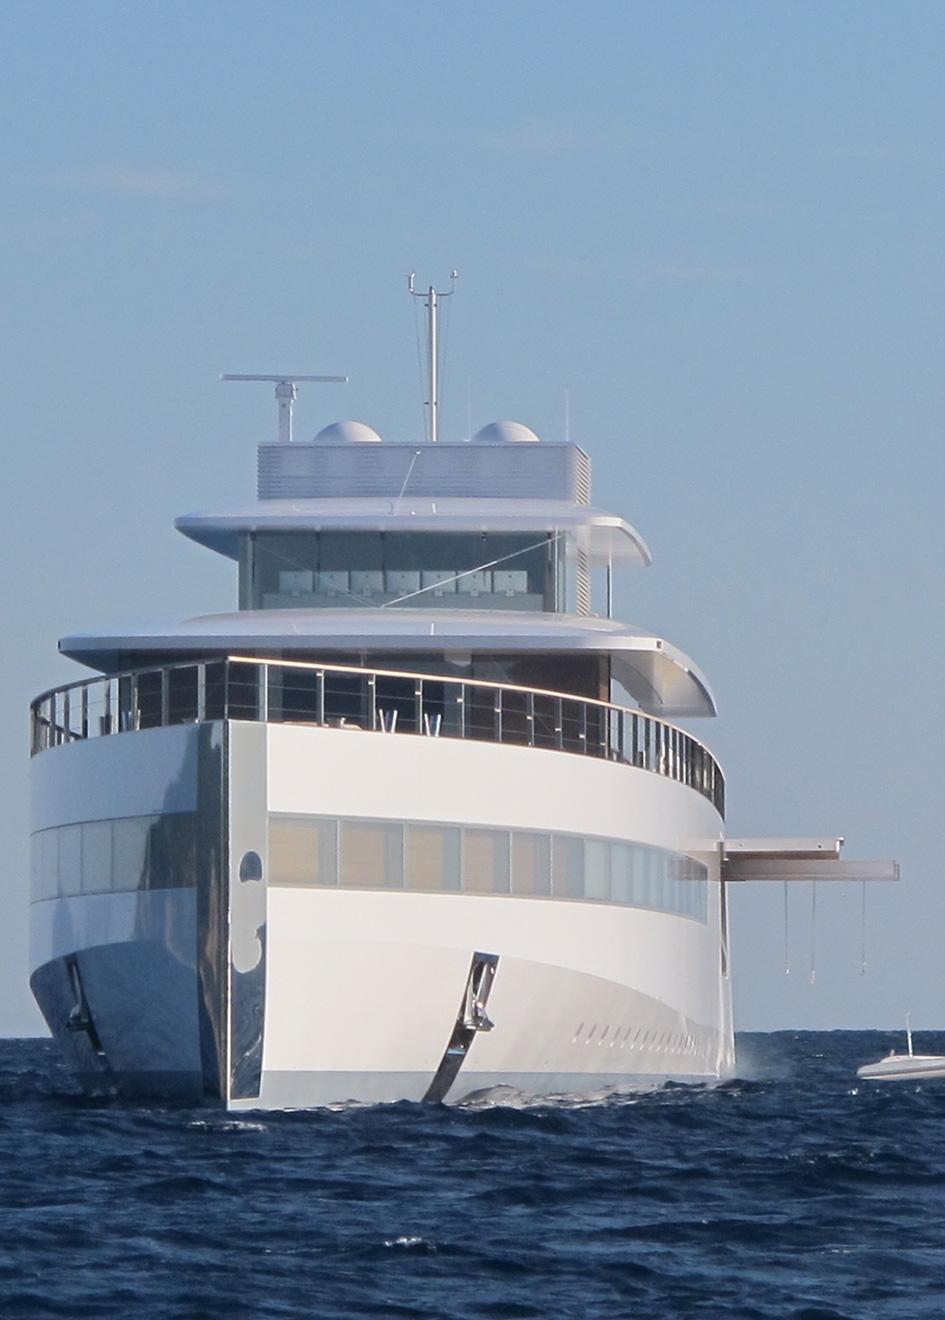 b5r7snhttq2eebrr0ayg_portrait-venus-yacht-tender-launched-1260x1760